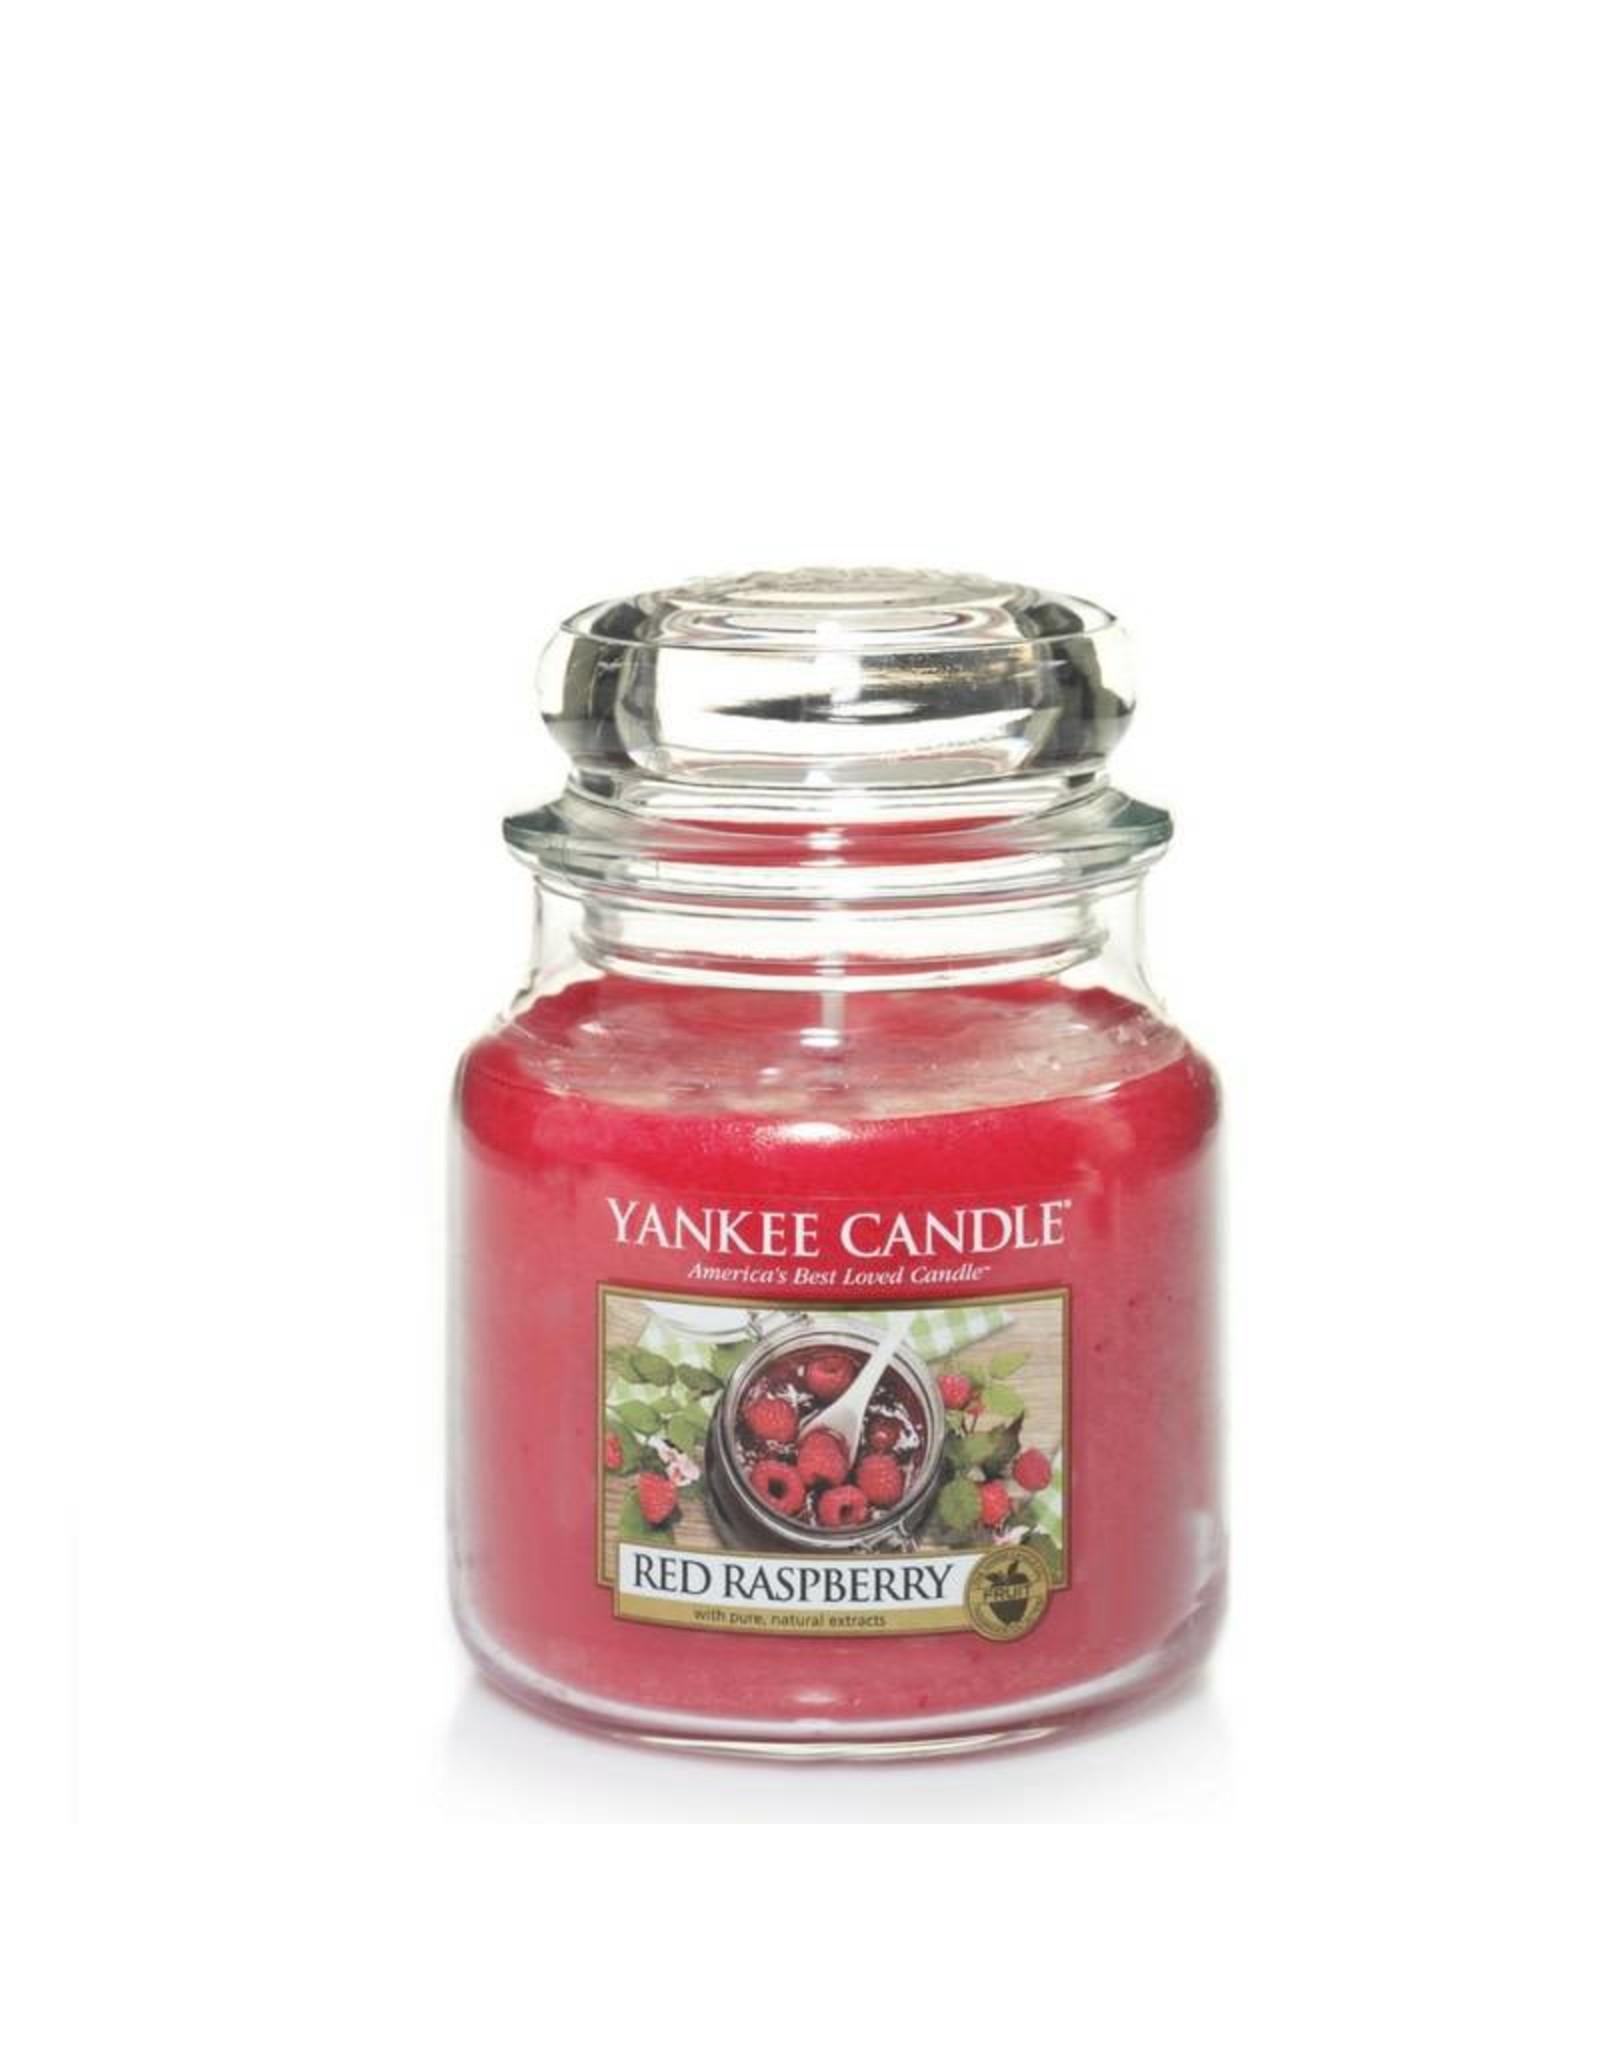 Yankee Candle Red Raspberry Medium Jar